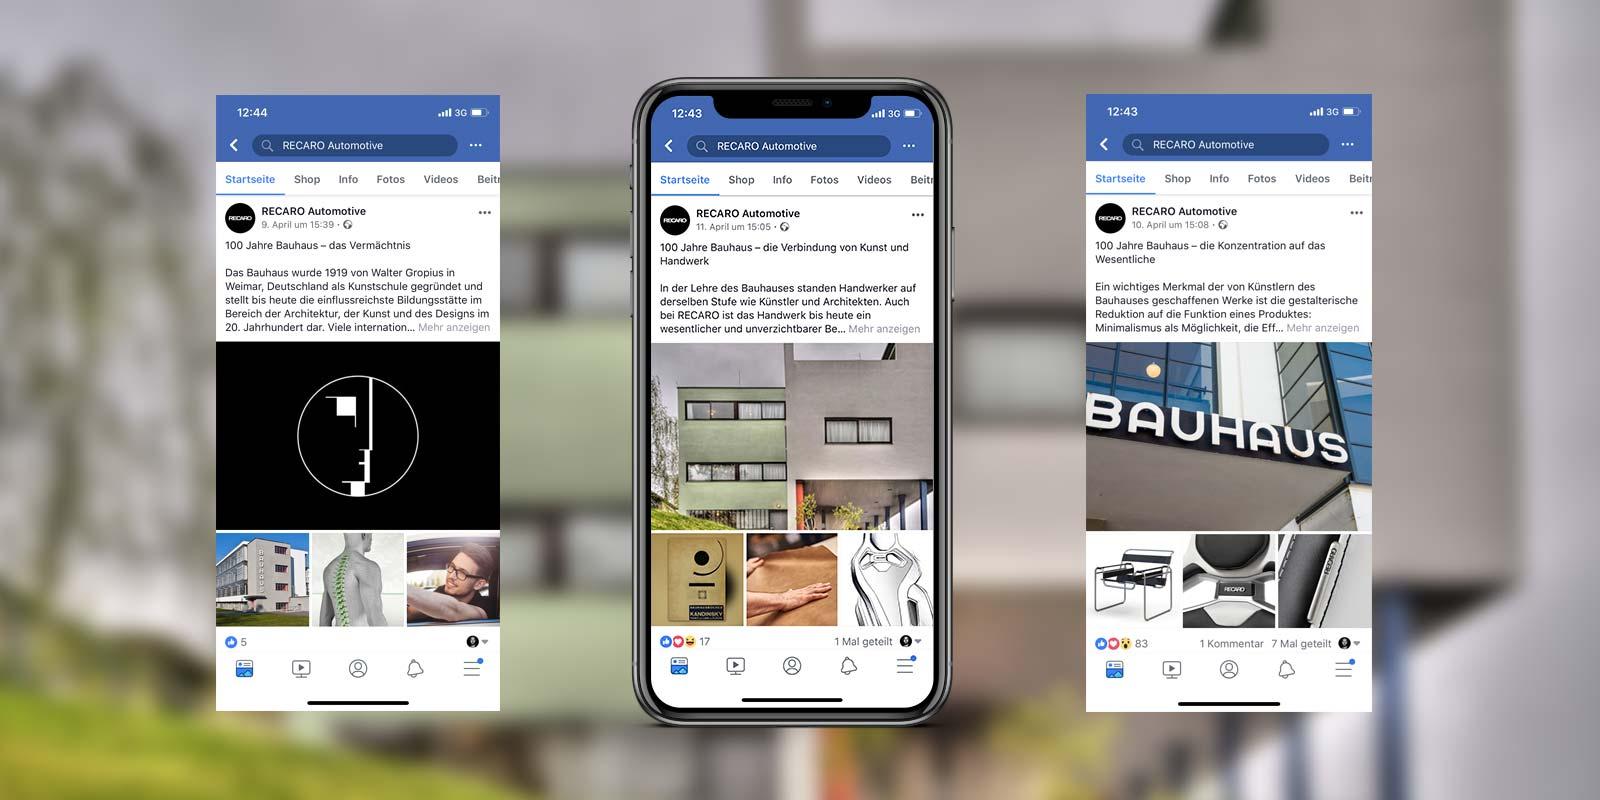 RECARO Post Bauhaus auf facebook